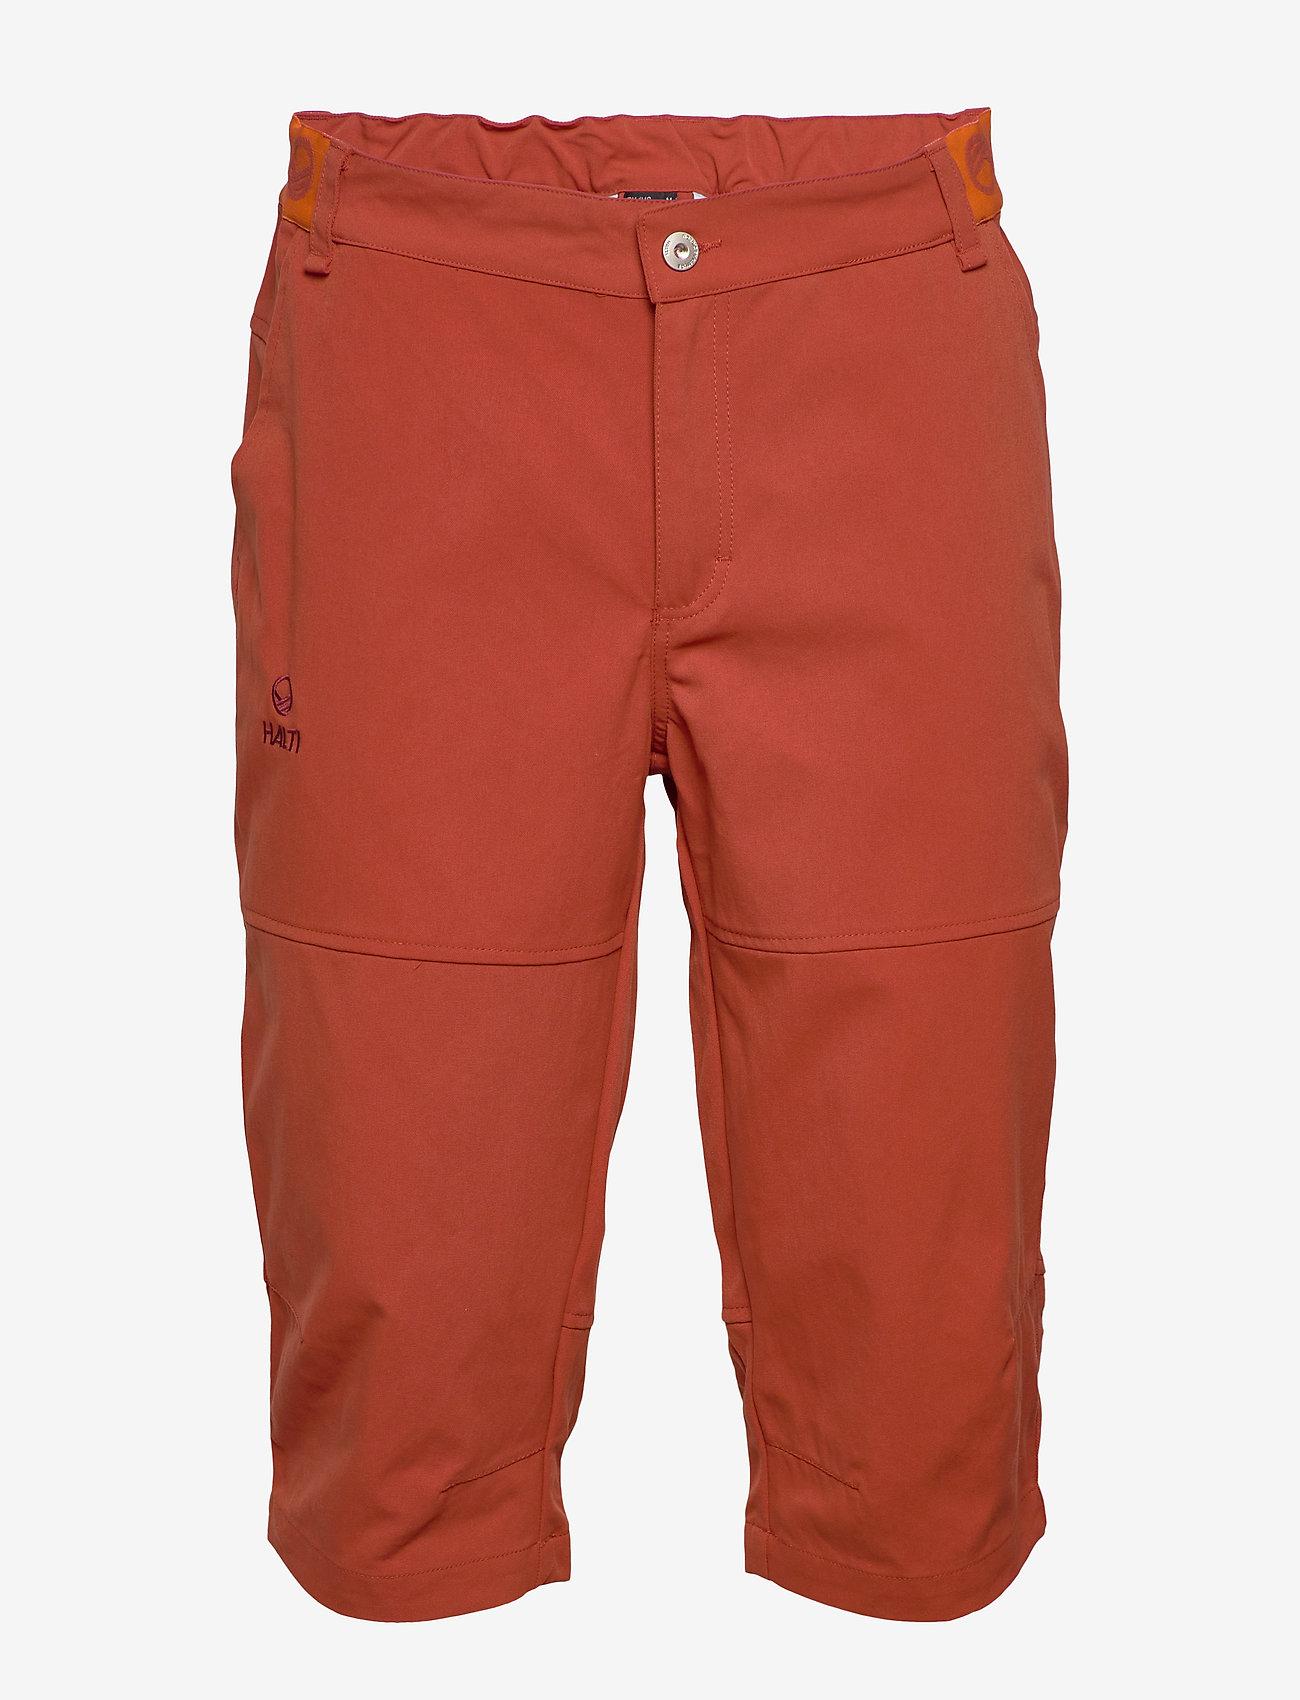 Halti - Vuokatti M Capri pants - wandel korte broek - ketchup red - 0